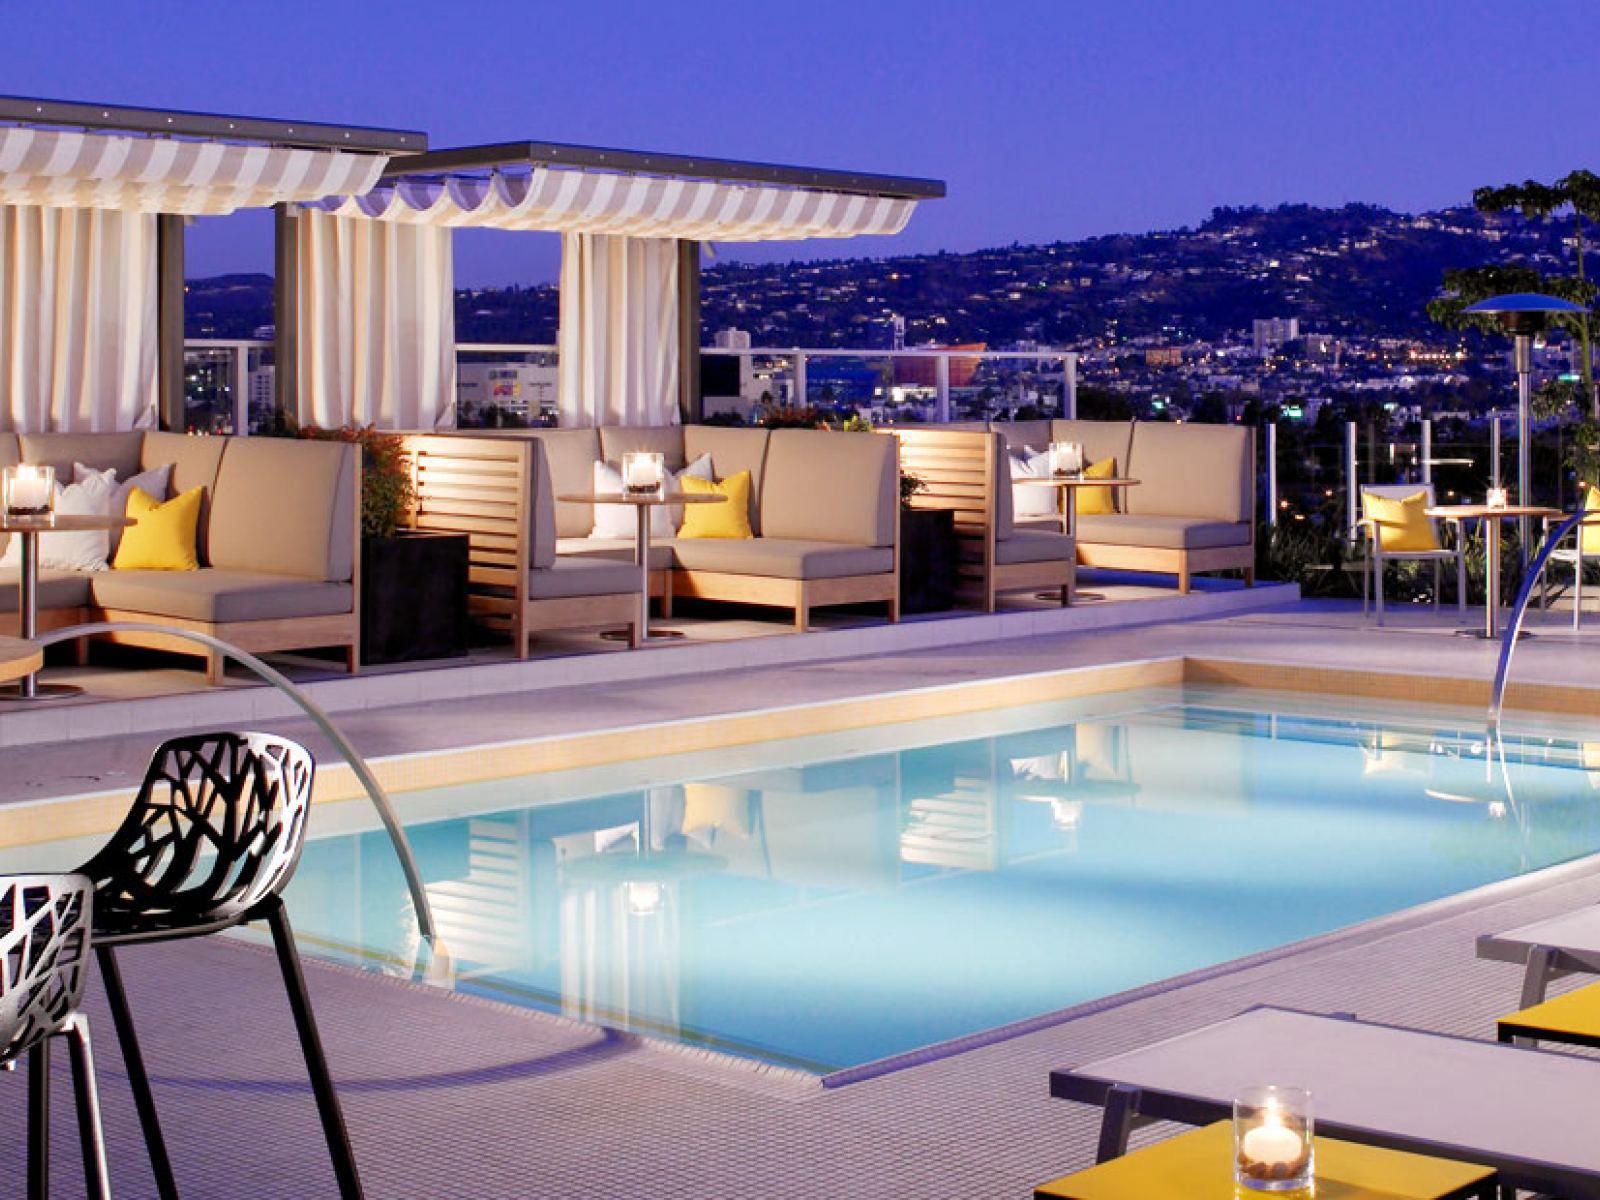 The Roof on Wilshire | Photo: Kimpton Hotel Wilshire, Facebook